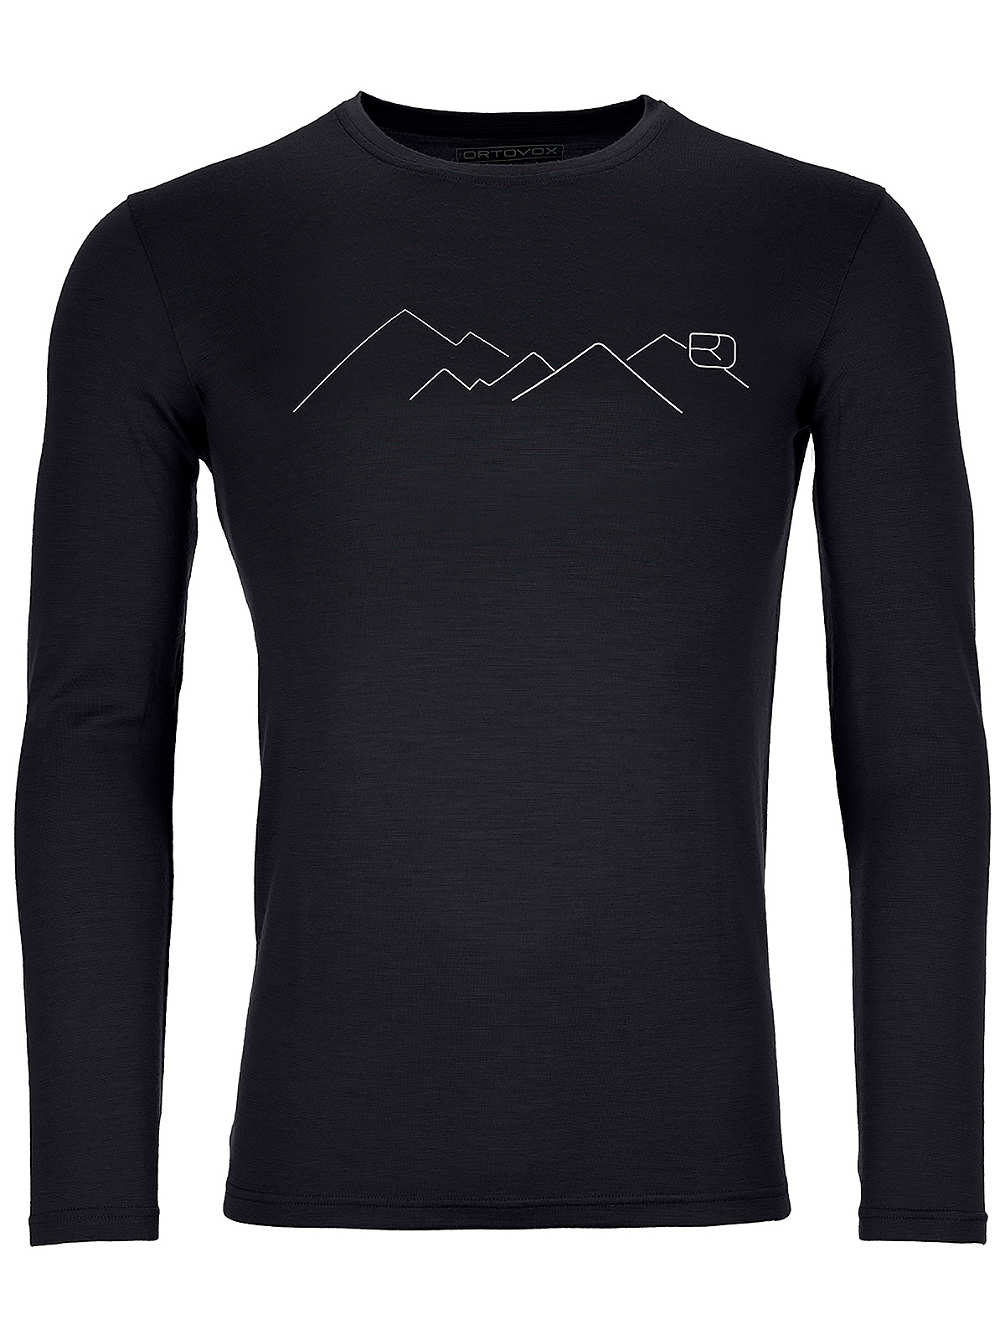 Ortovox - tričko T 185 Merino Mountain LS black raven Velikost: XL